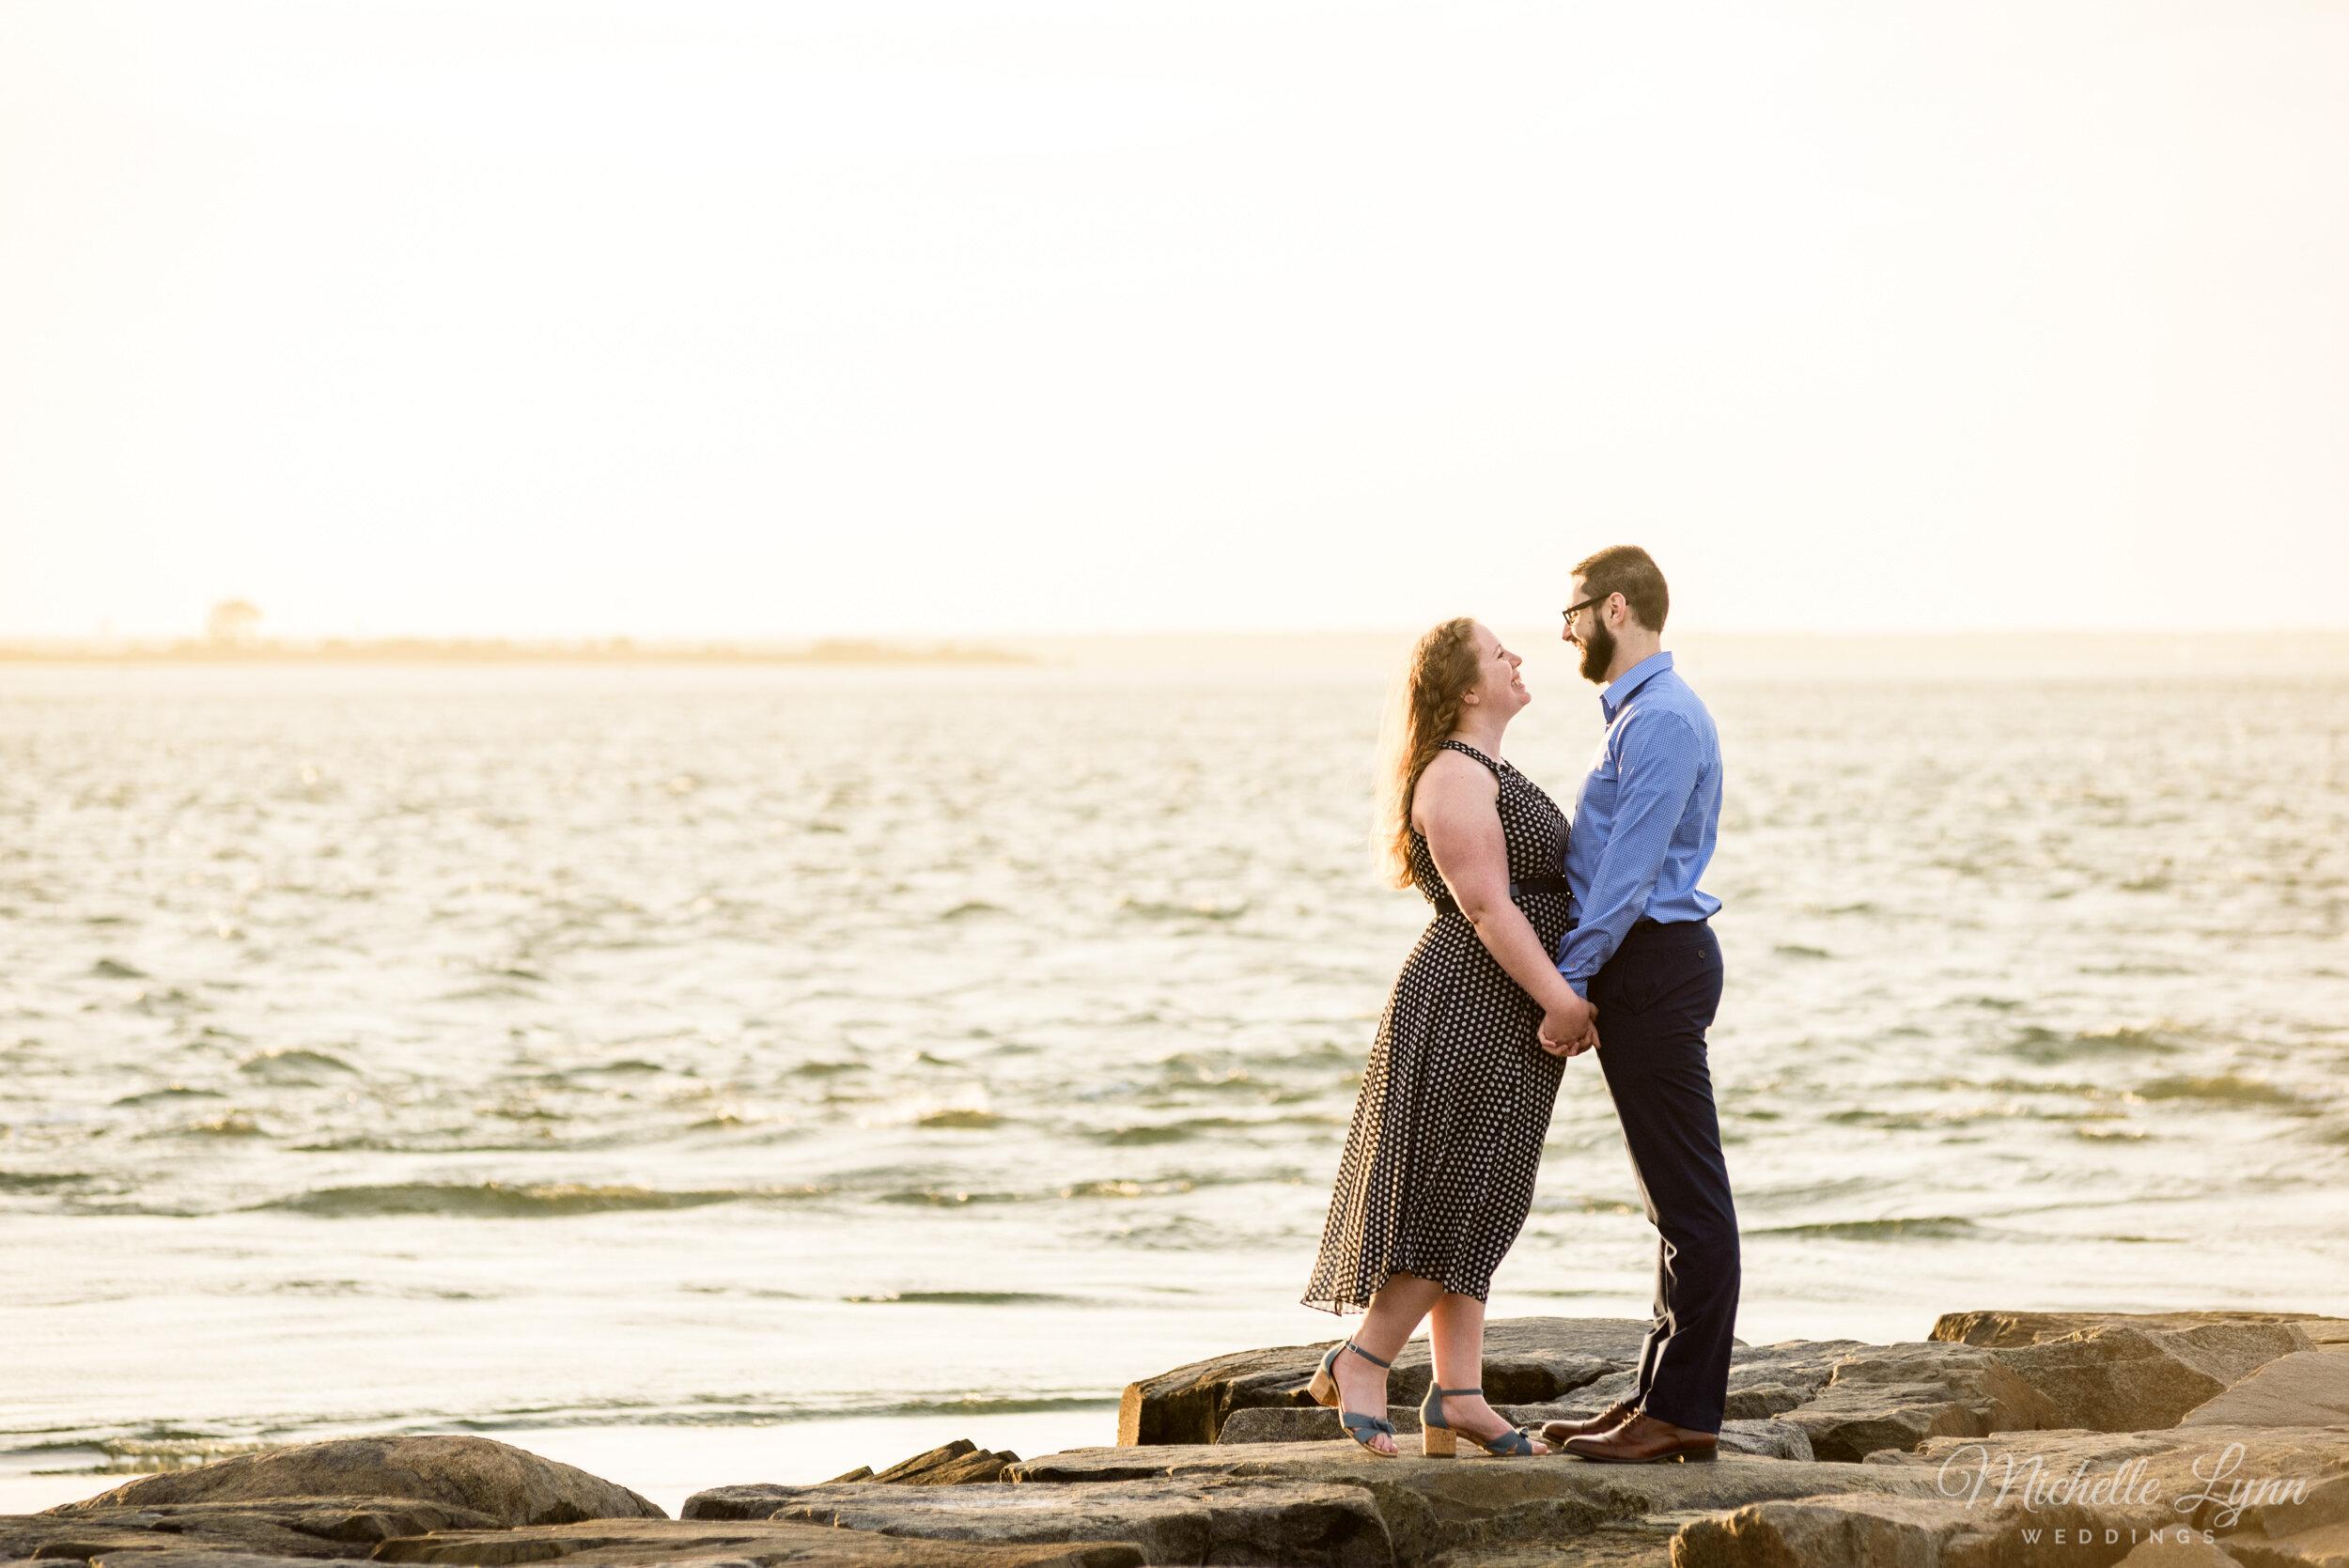 barnegat-lighthouse-engagement-photos-michelle-lynn-weddings-1.jpg